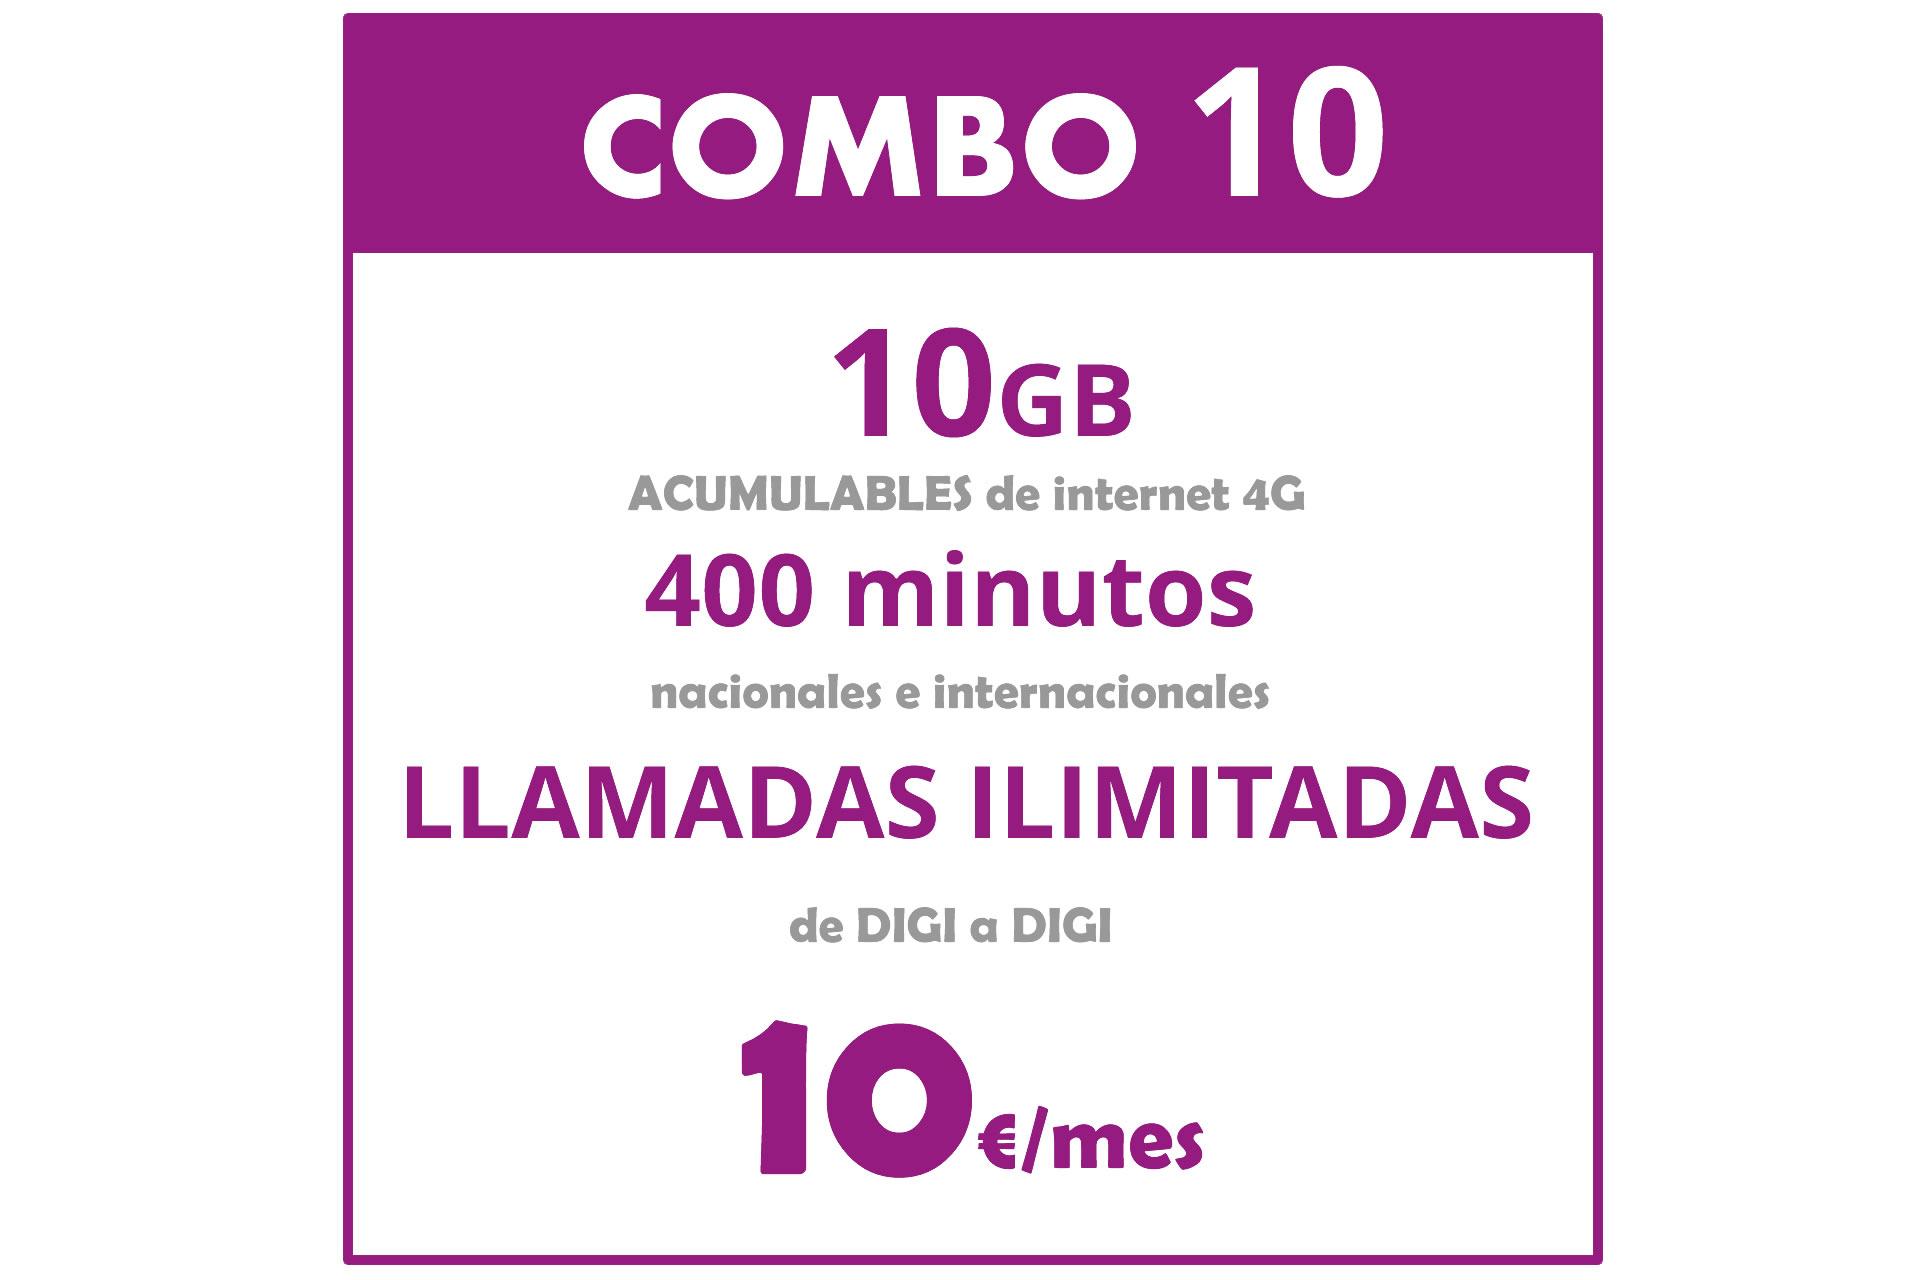 combo10-digimobil-puntod-calasparra-caravaca-digicombo-digi-ilimitado-tarifas-digi